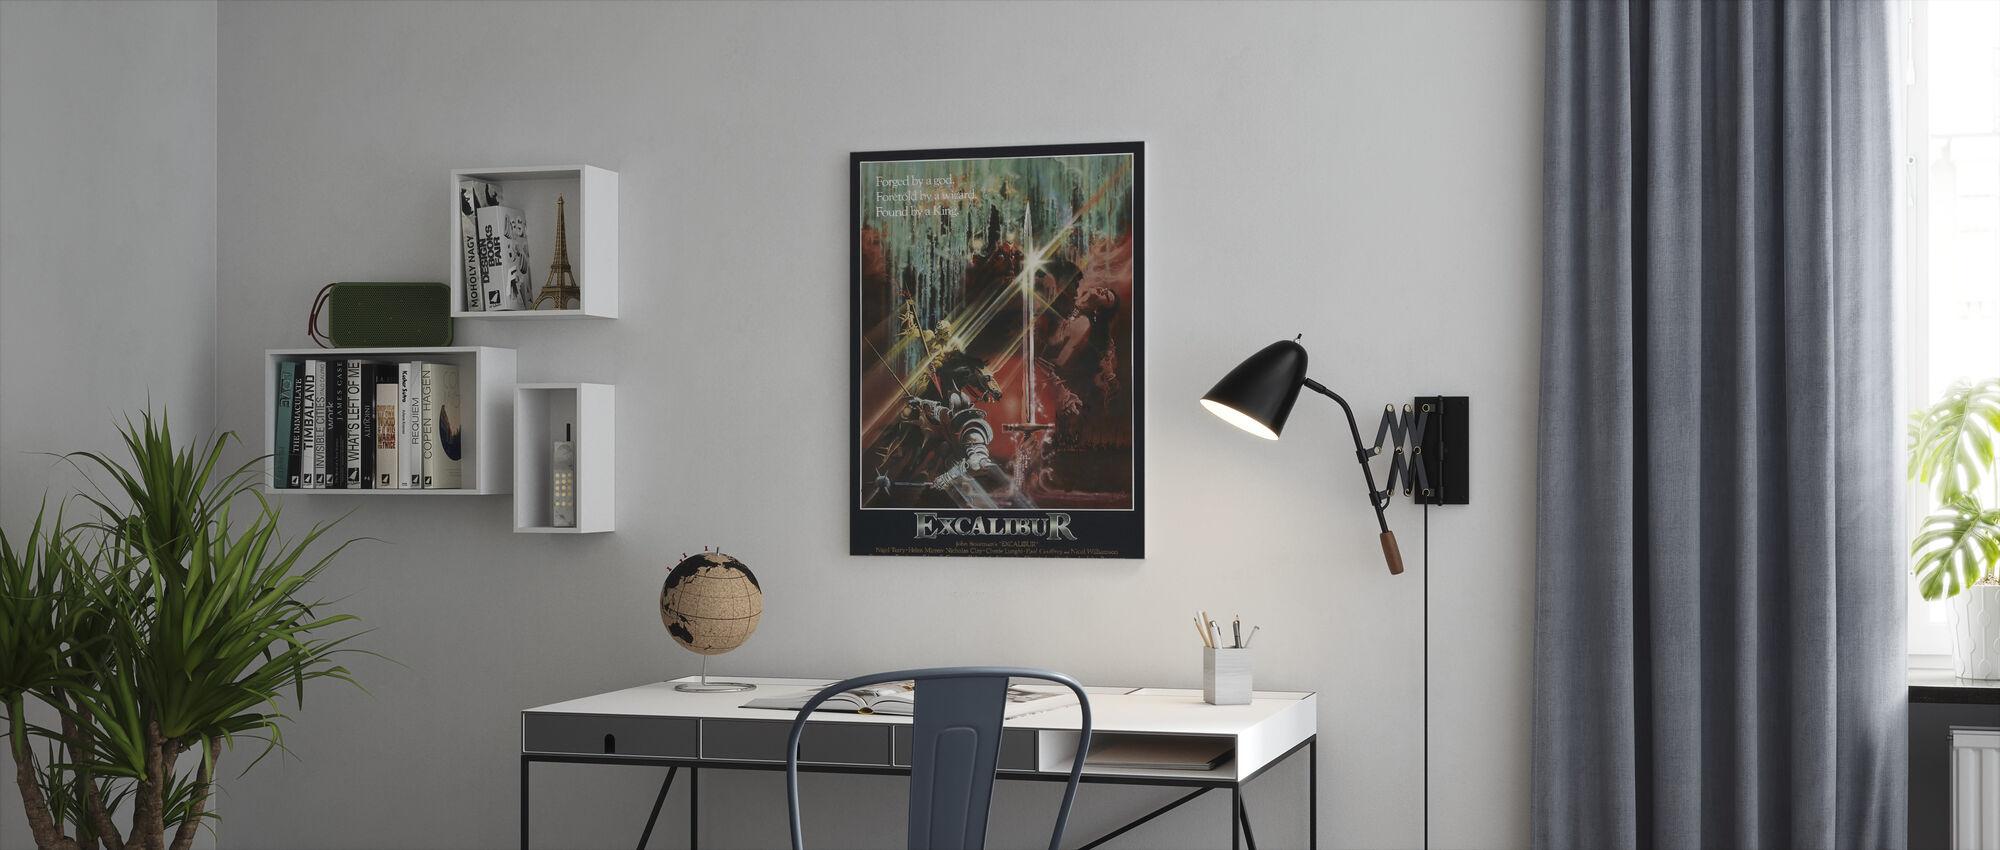 Excalibur - Canvas print - Office